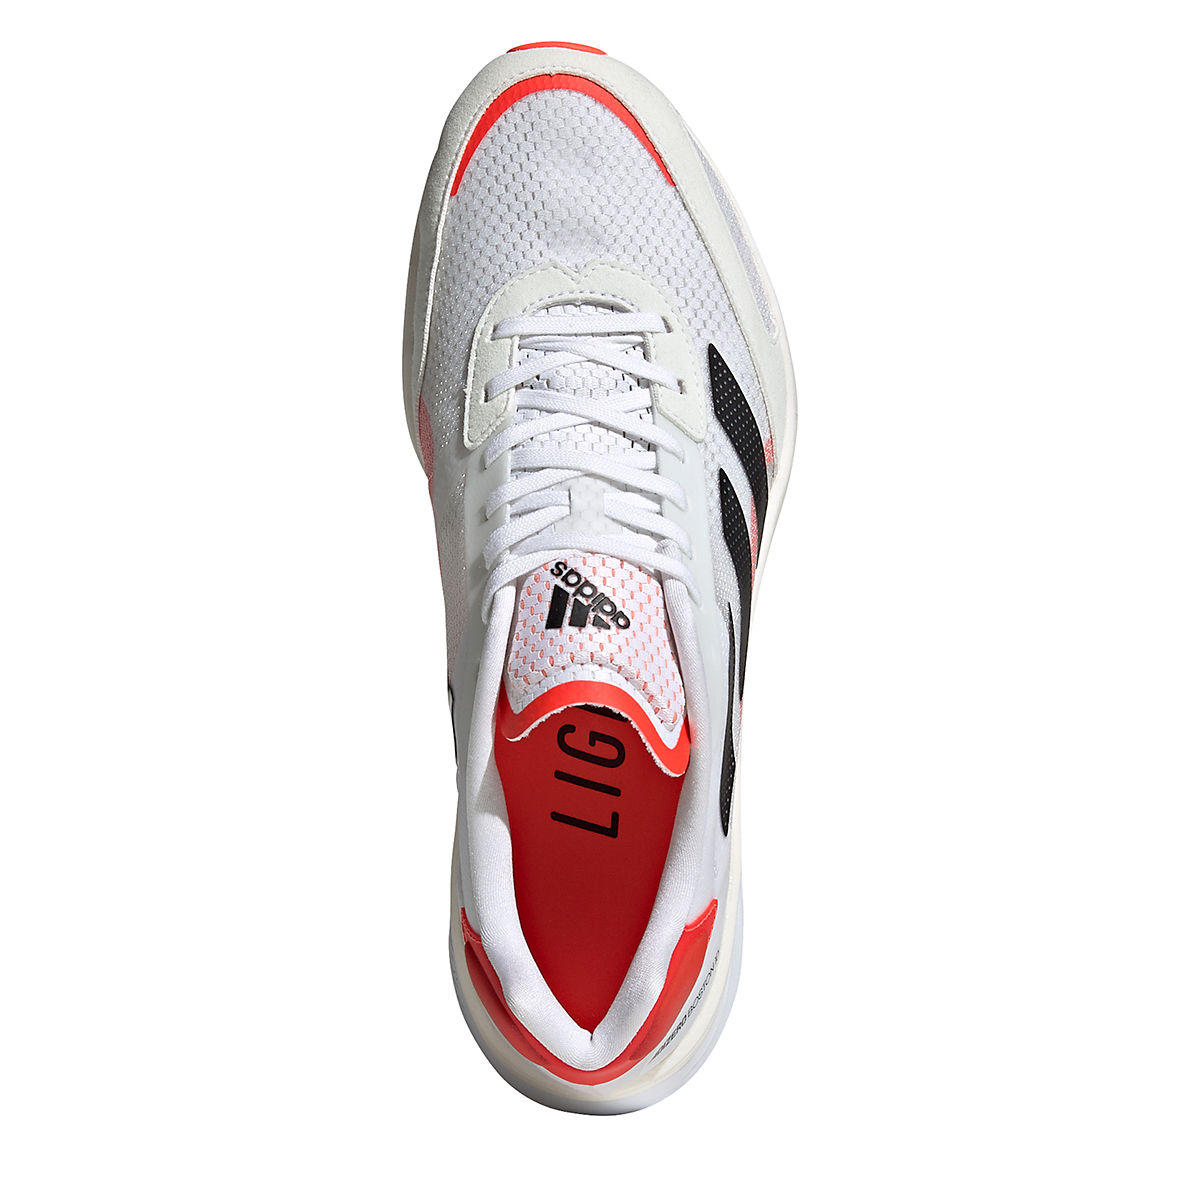 Men's Adidas Adizero Boston 10 Running Shoe - Color: Black/White/Solar Red - Size: 7 - Width: Regular, Black/White/Solar Red, large, image 7